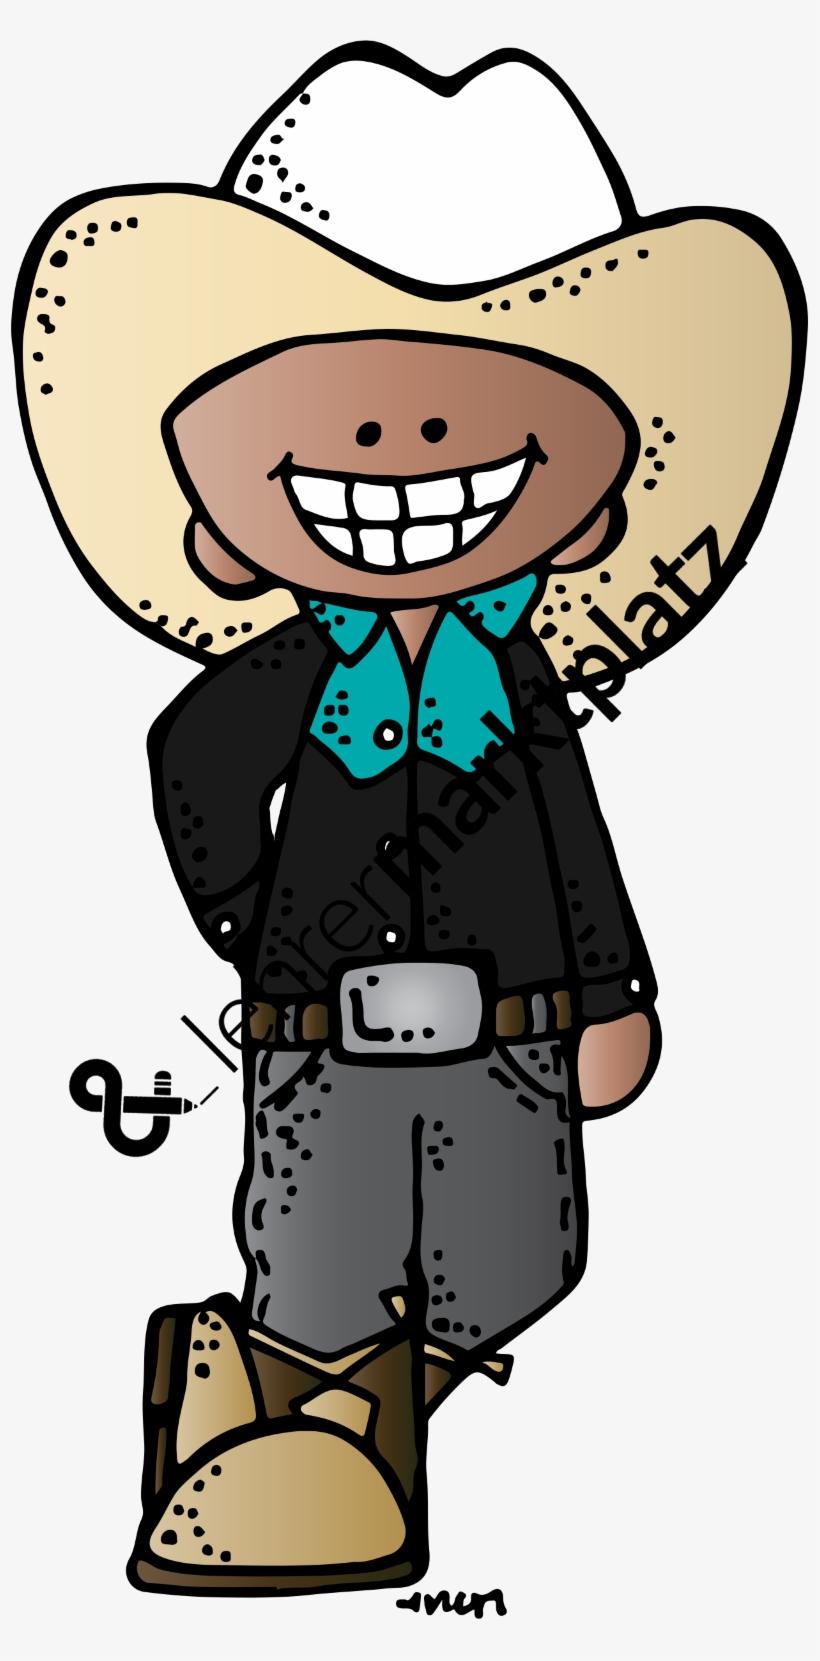 Graphic Freeuse Clip Art Cowboys Und Cowgirls Farbig - Melonheadz Clip Art Cowboy, transparent png #6344061